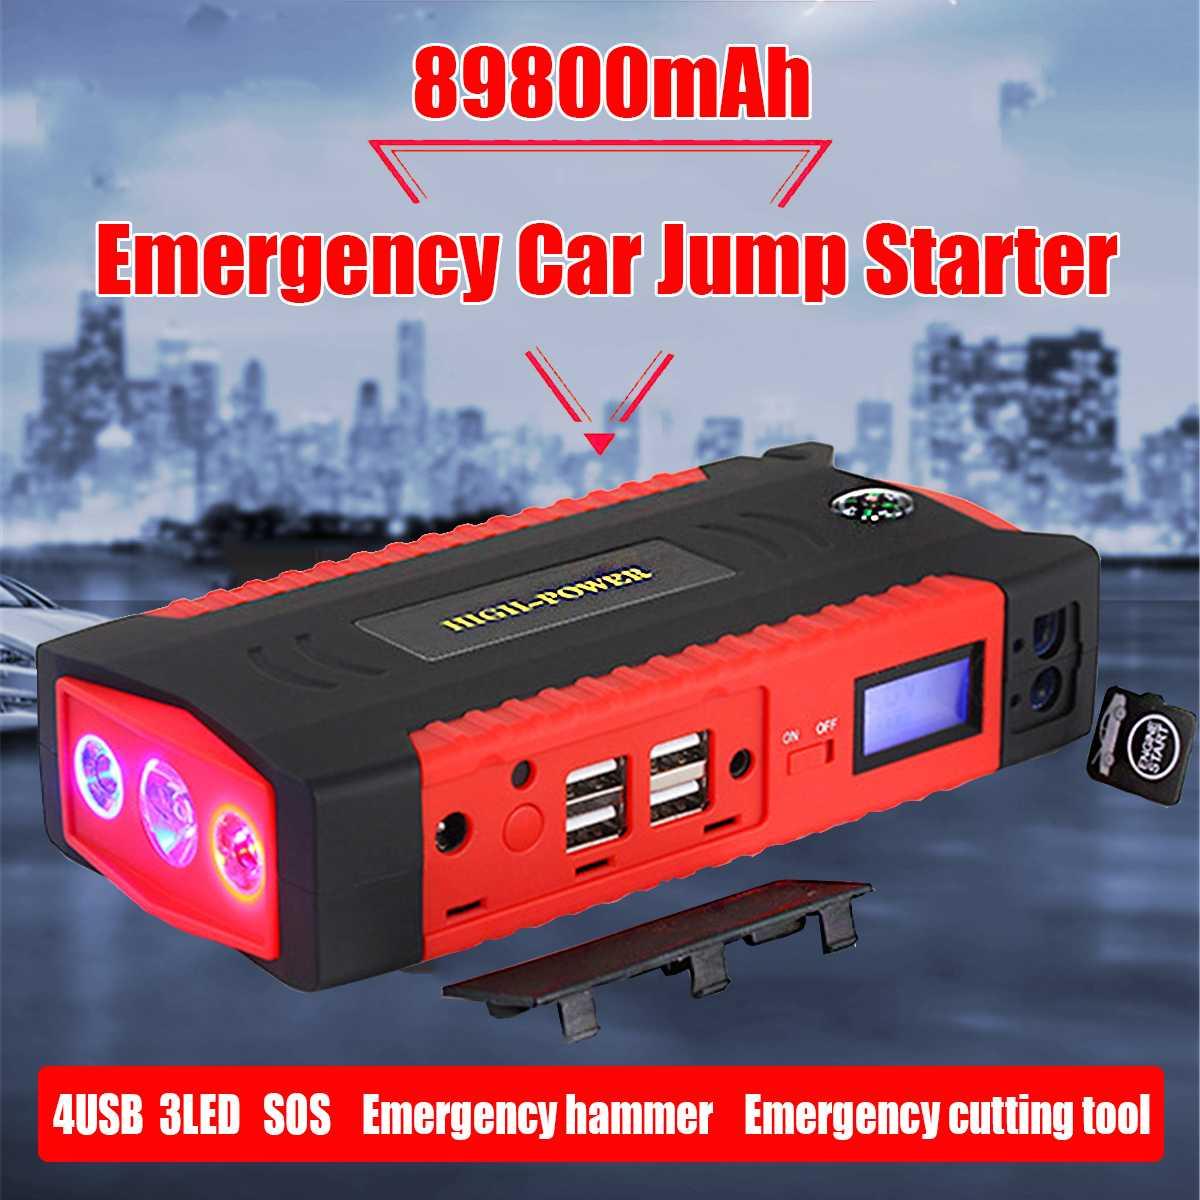 89800mAh Car Jump Starter Portable Power Bank 4 USB Battery Booster Charger 12V Starting Device Petrol